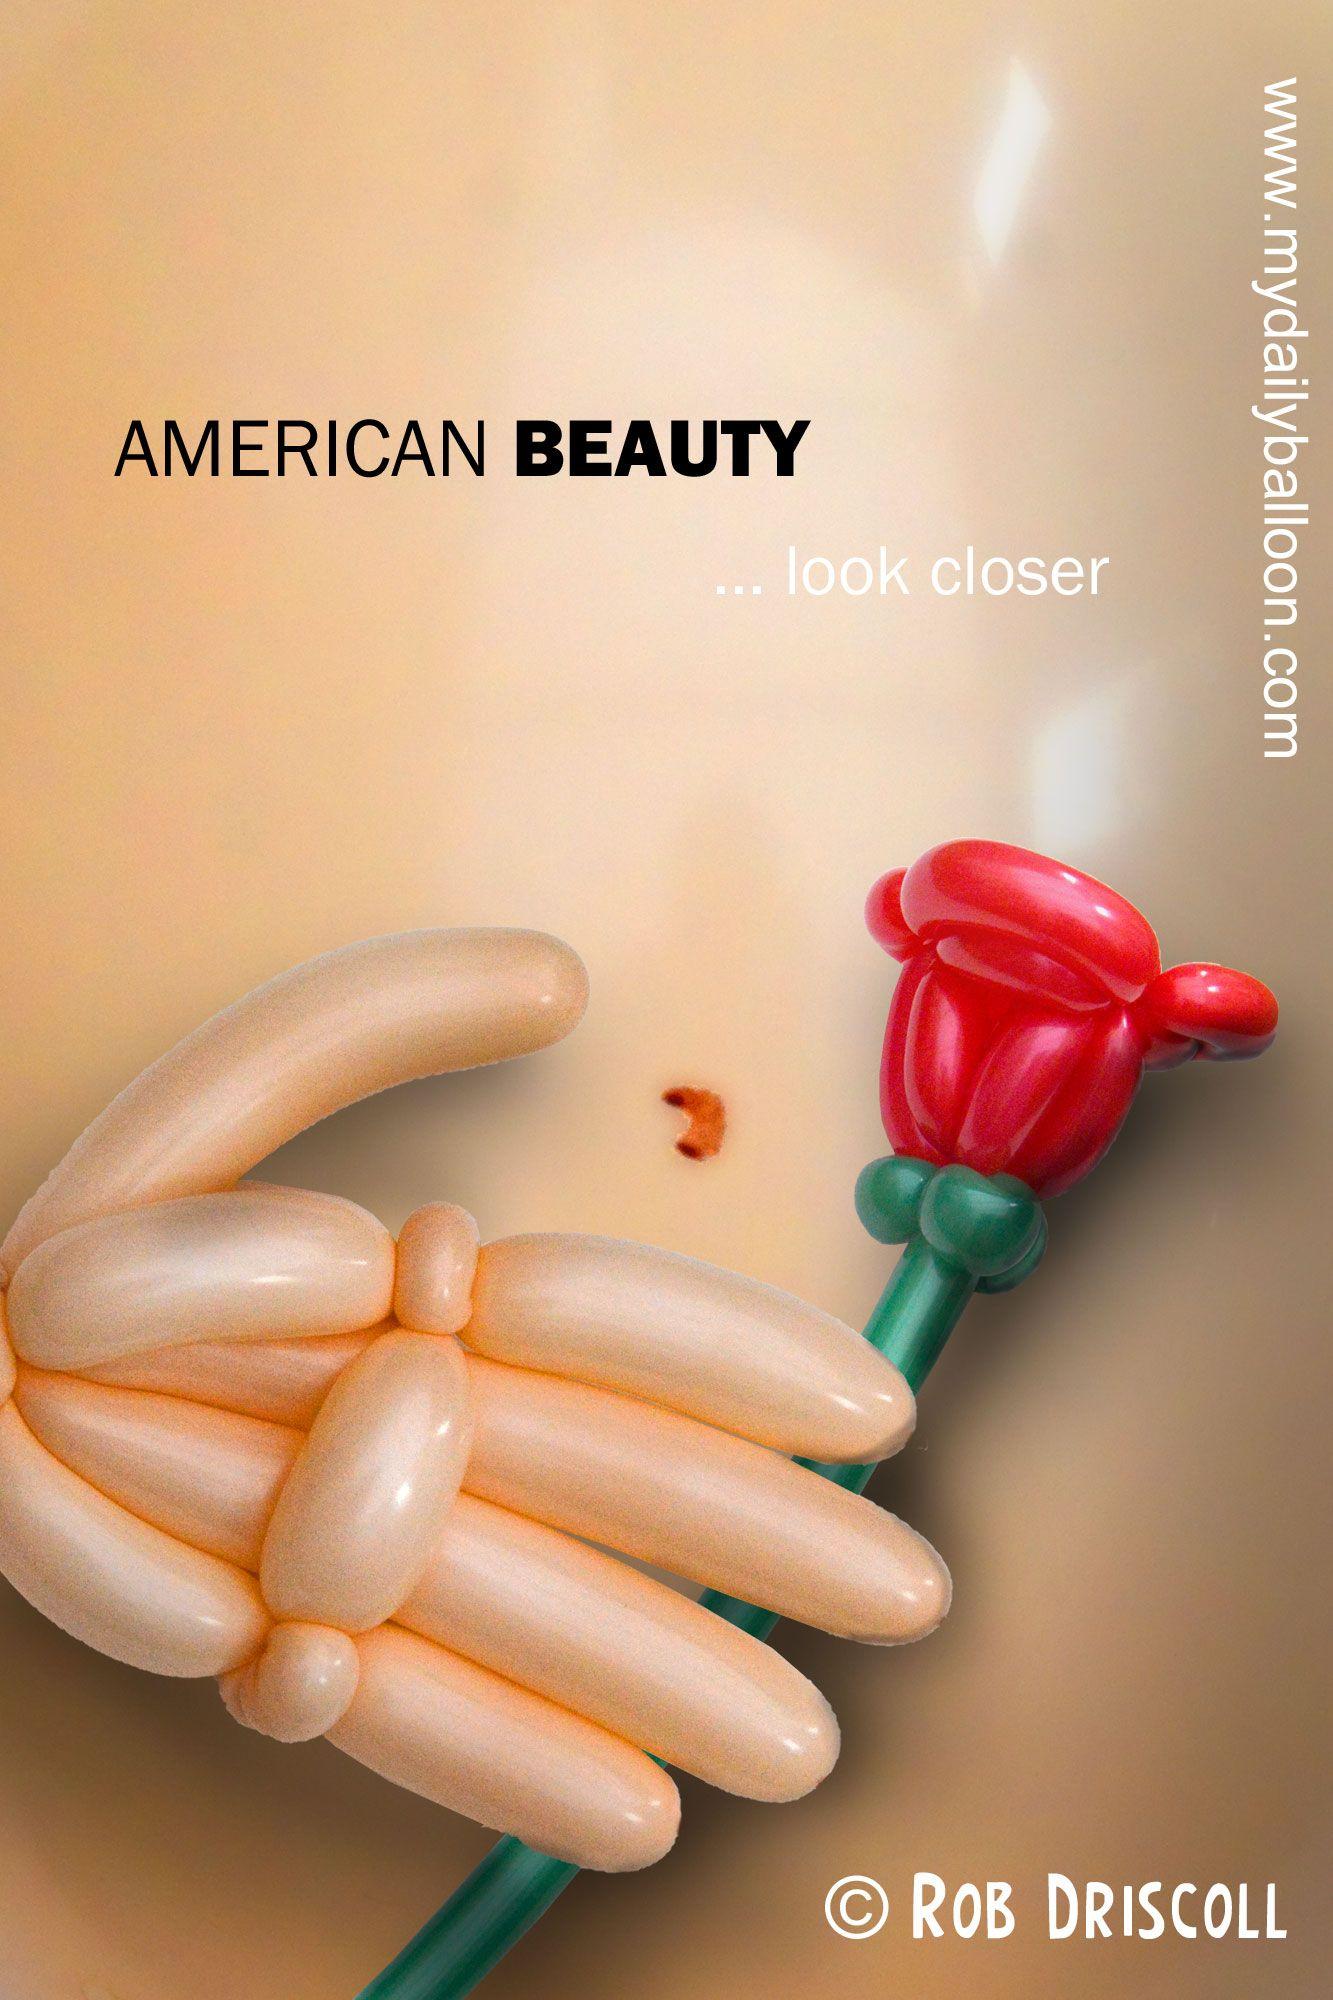 Twisted Cinema - American beauty